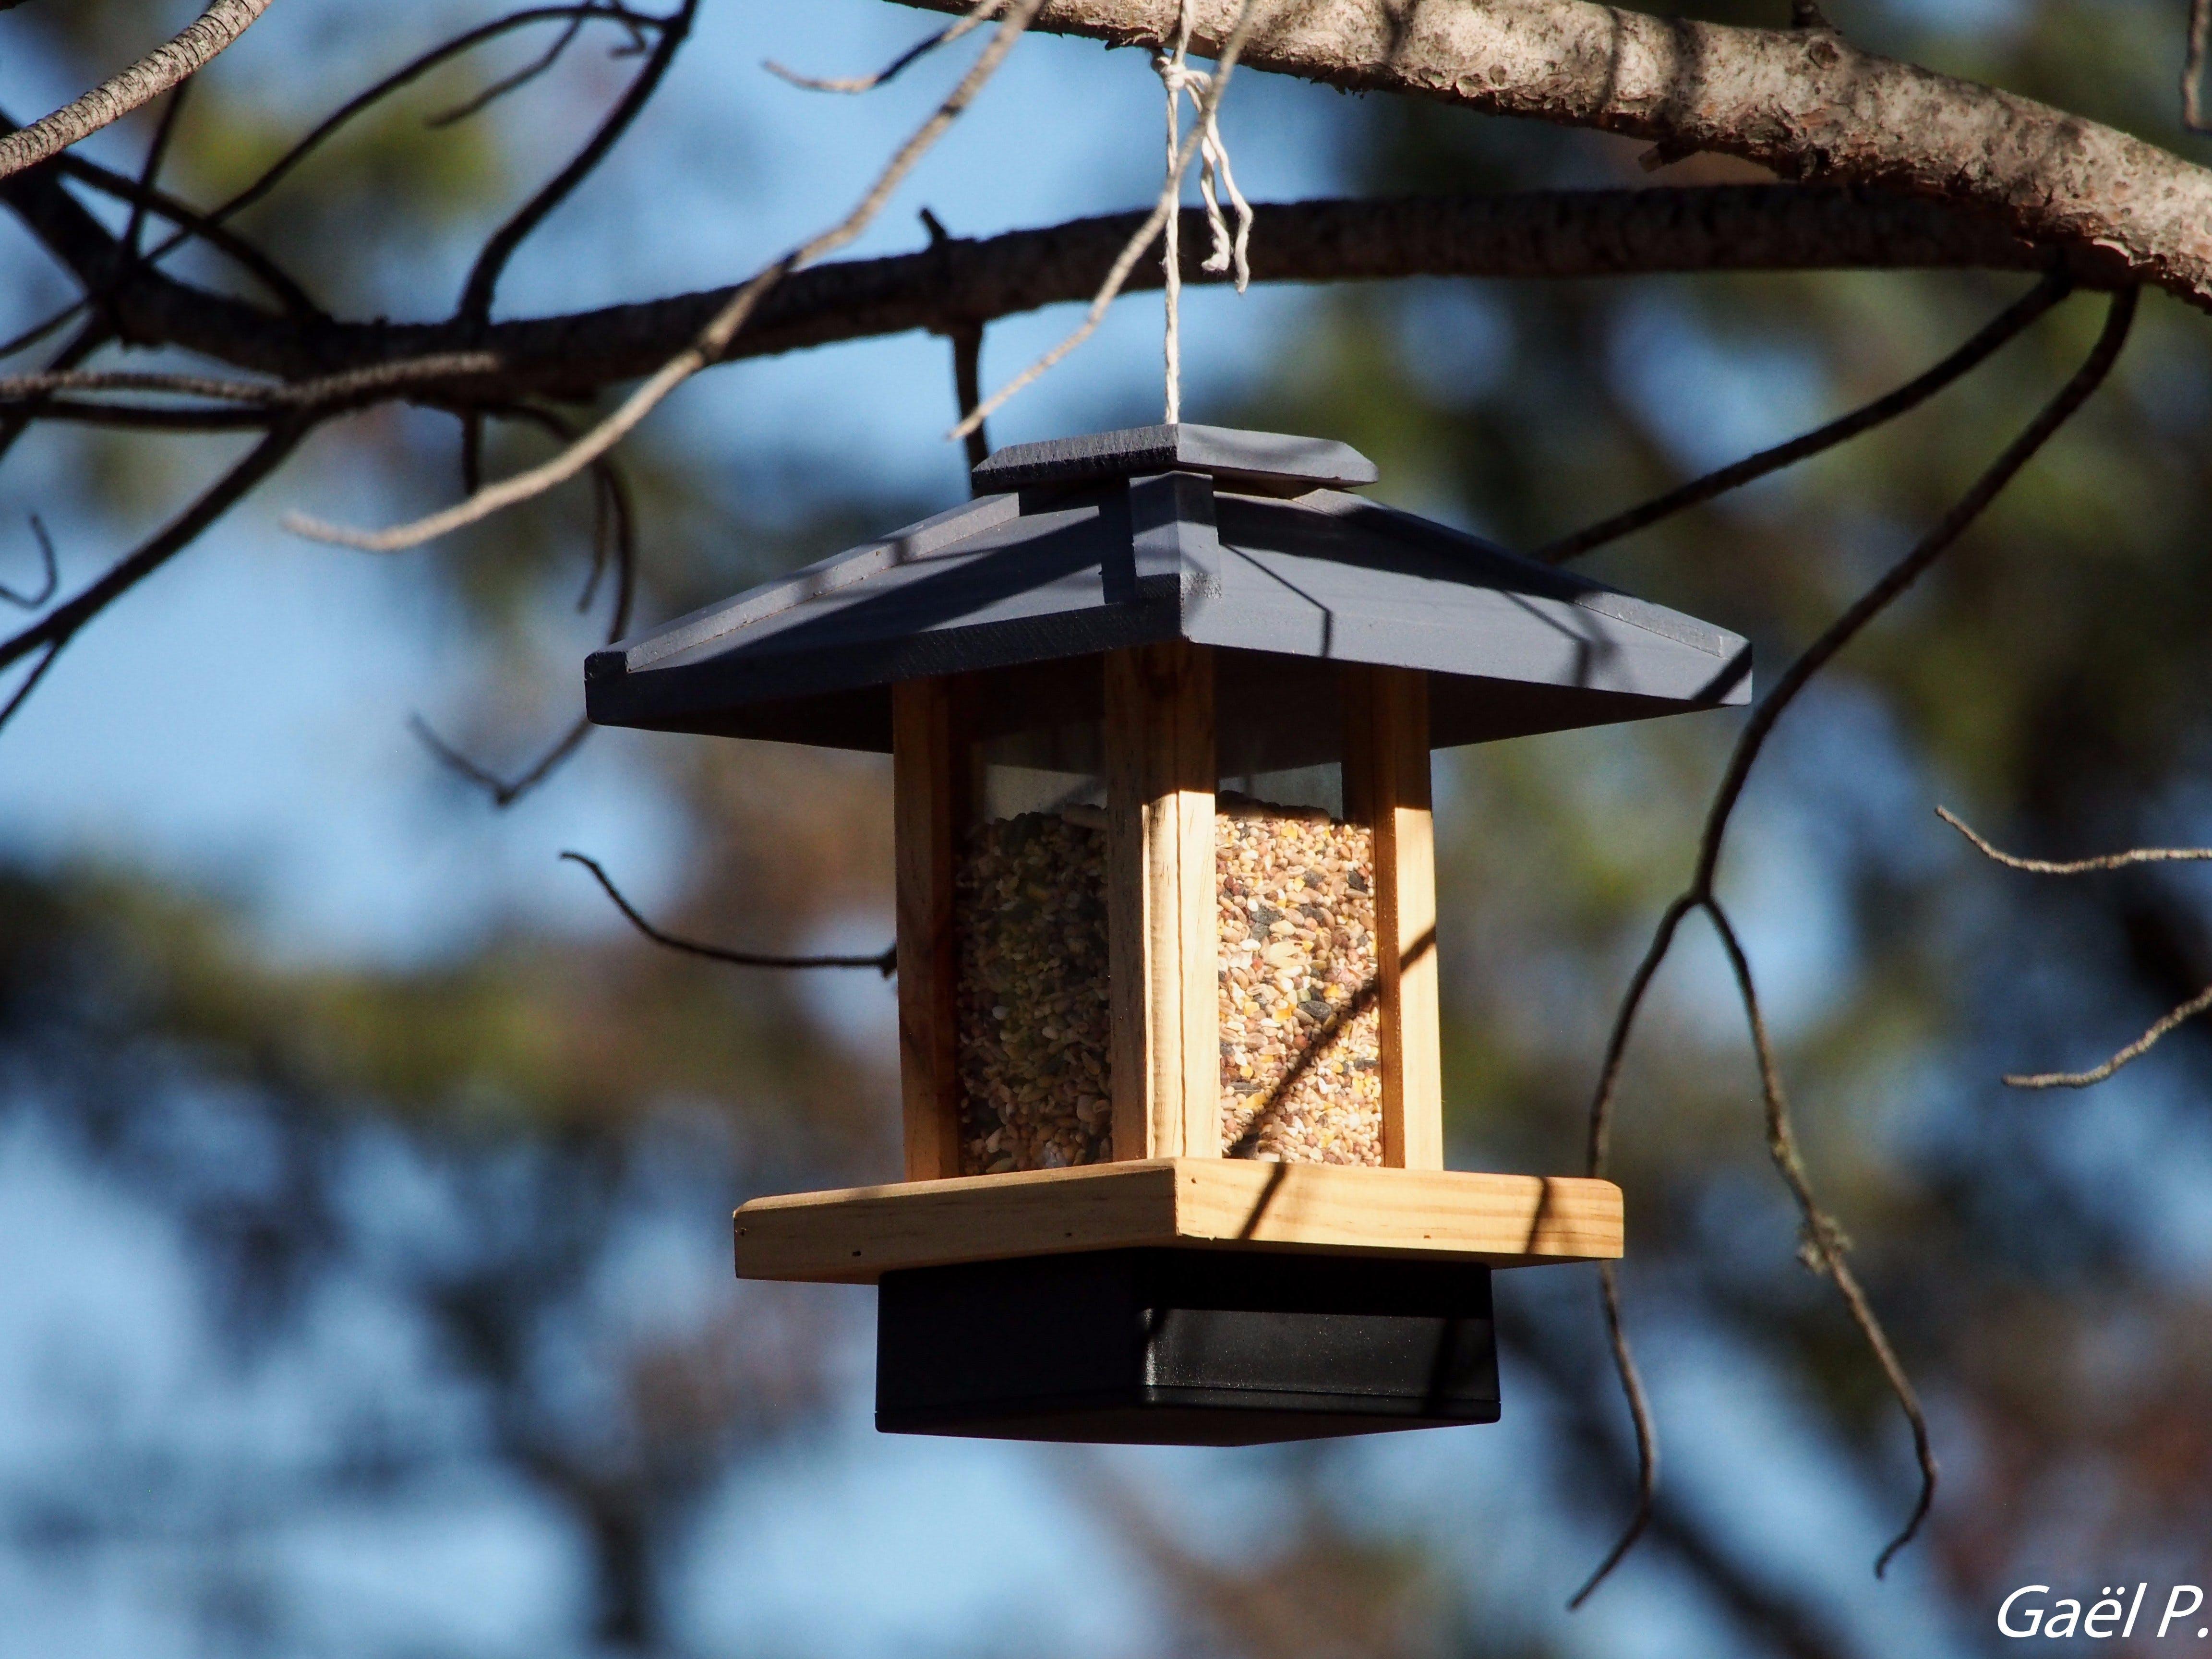 IoT Bird Feeder with Sigfox and Tweeter